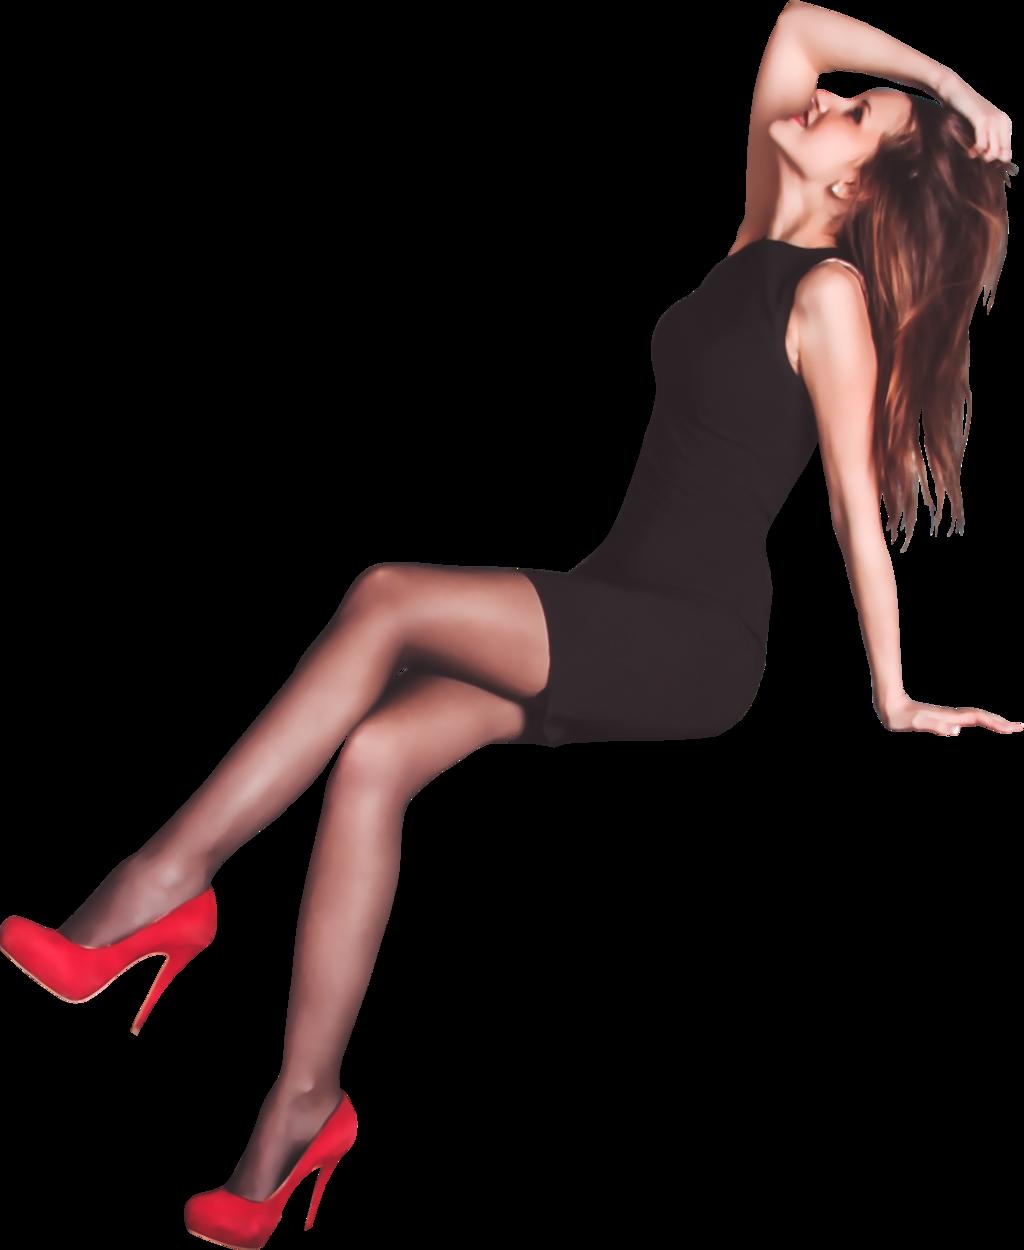 Girl_png__6_by_bettadenu-d9lzm46.pngGirl Model Png - Girls PNG